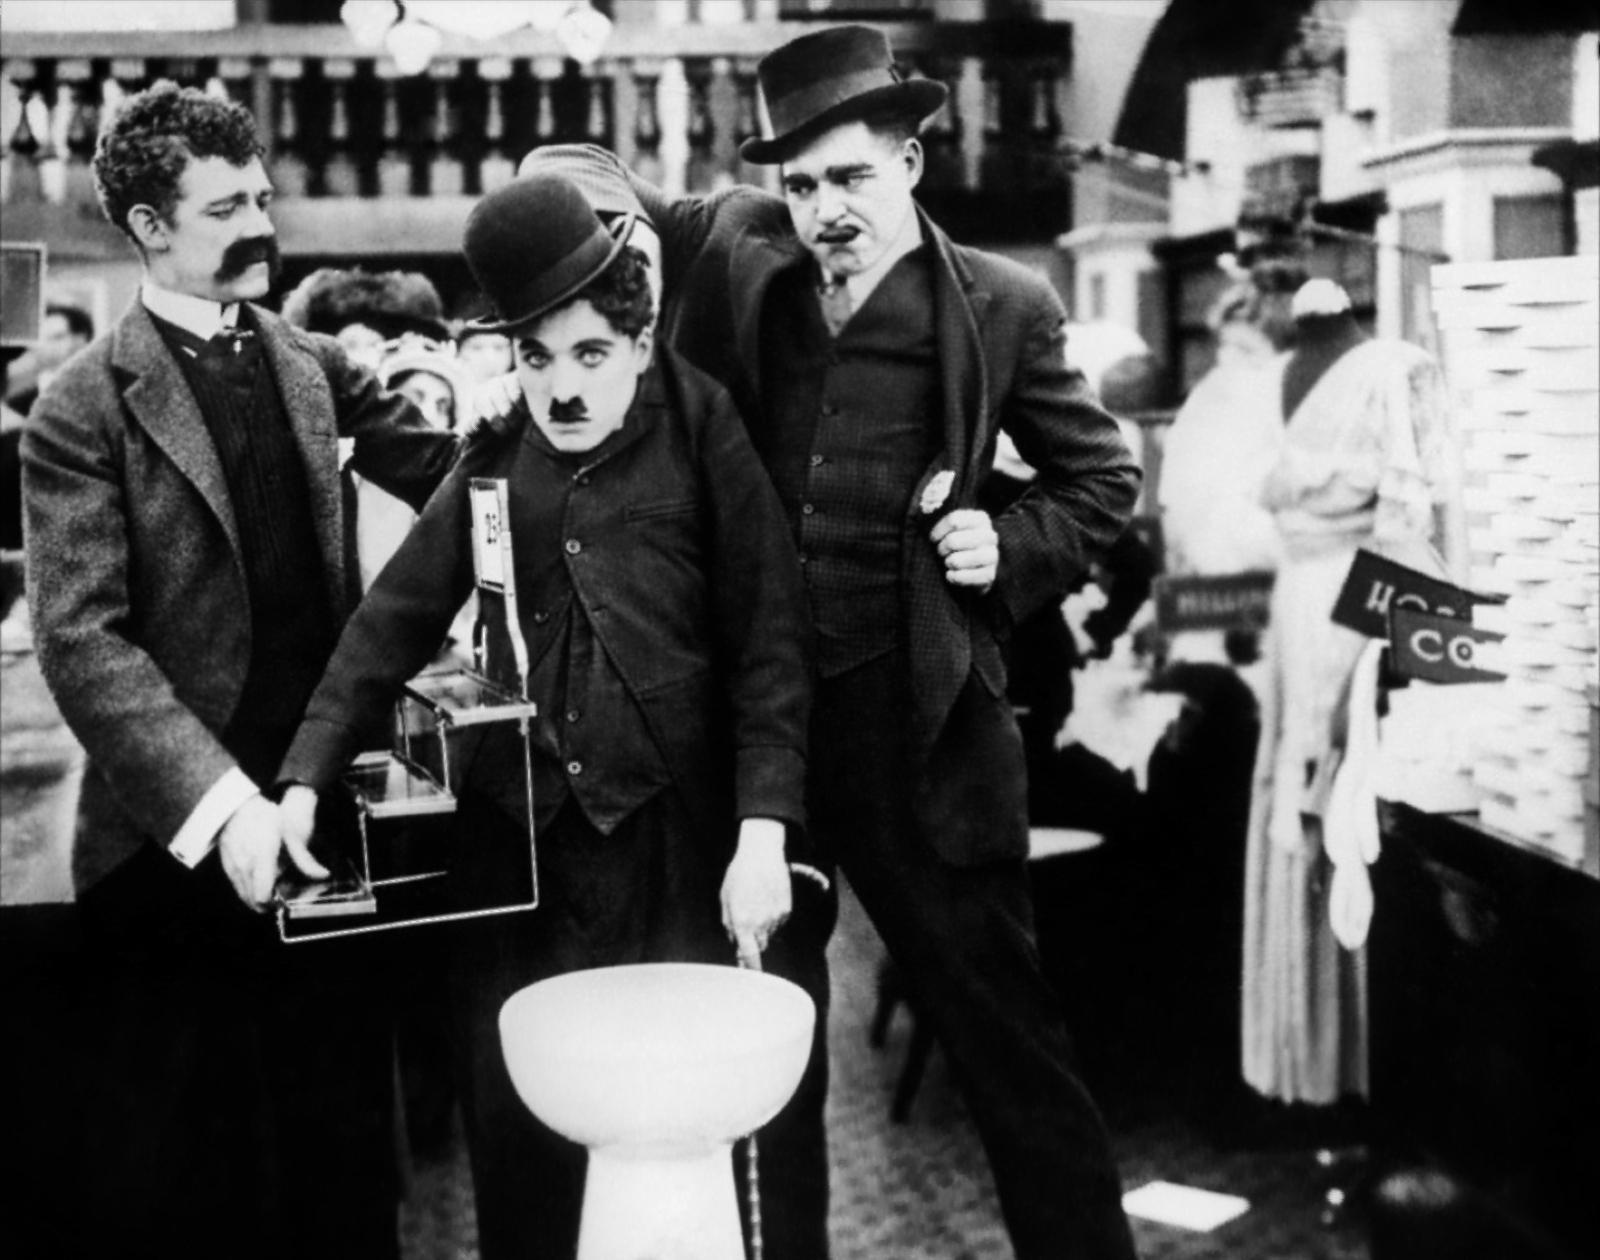 (L to R) Albert Austin, Charlie Chaplin, John Rand